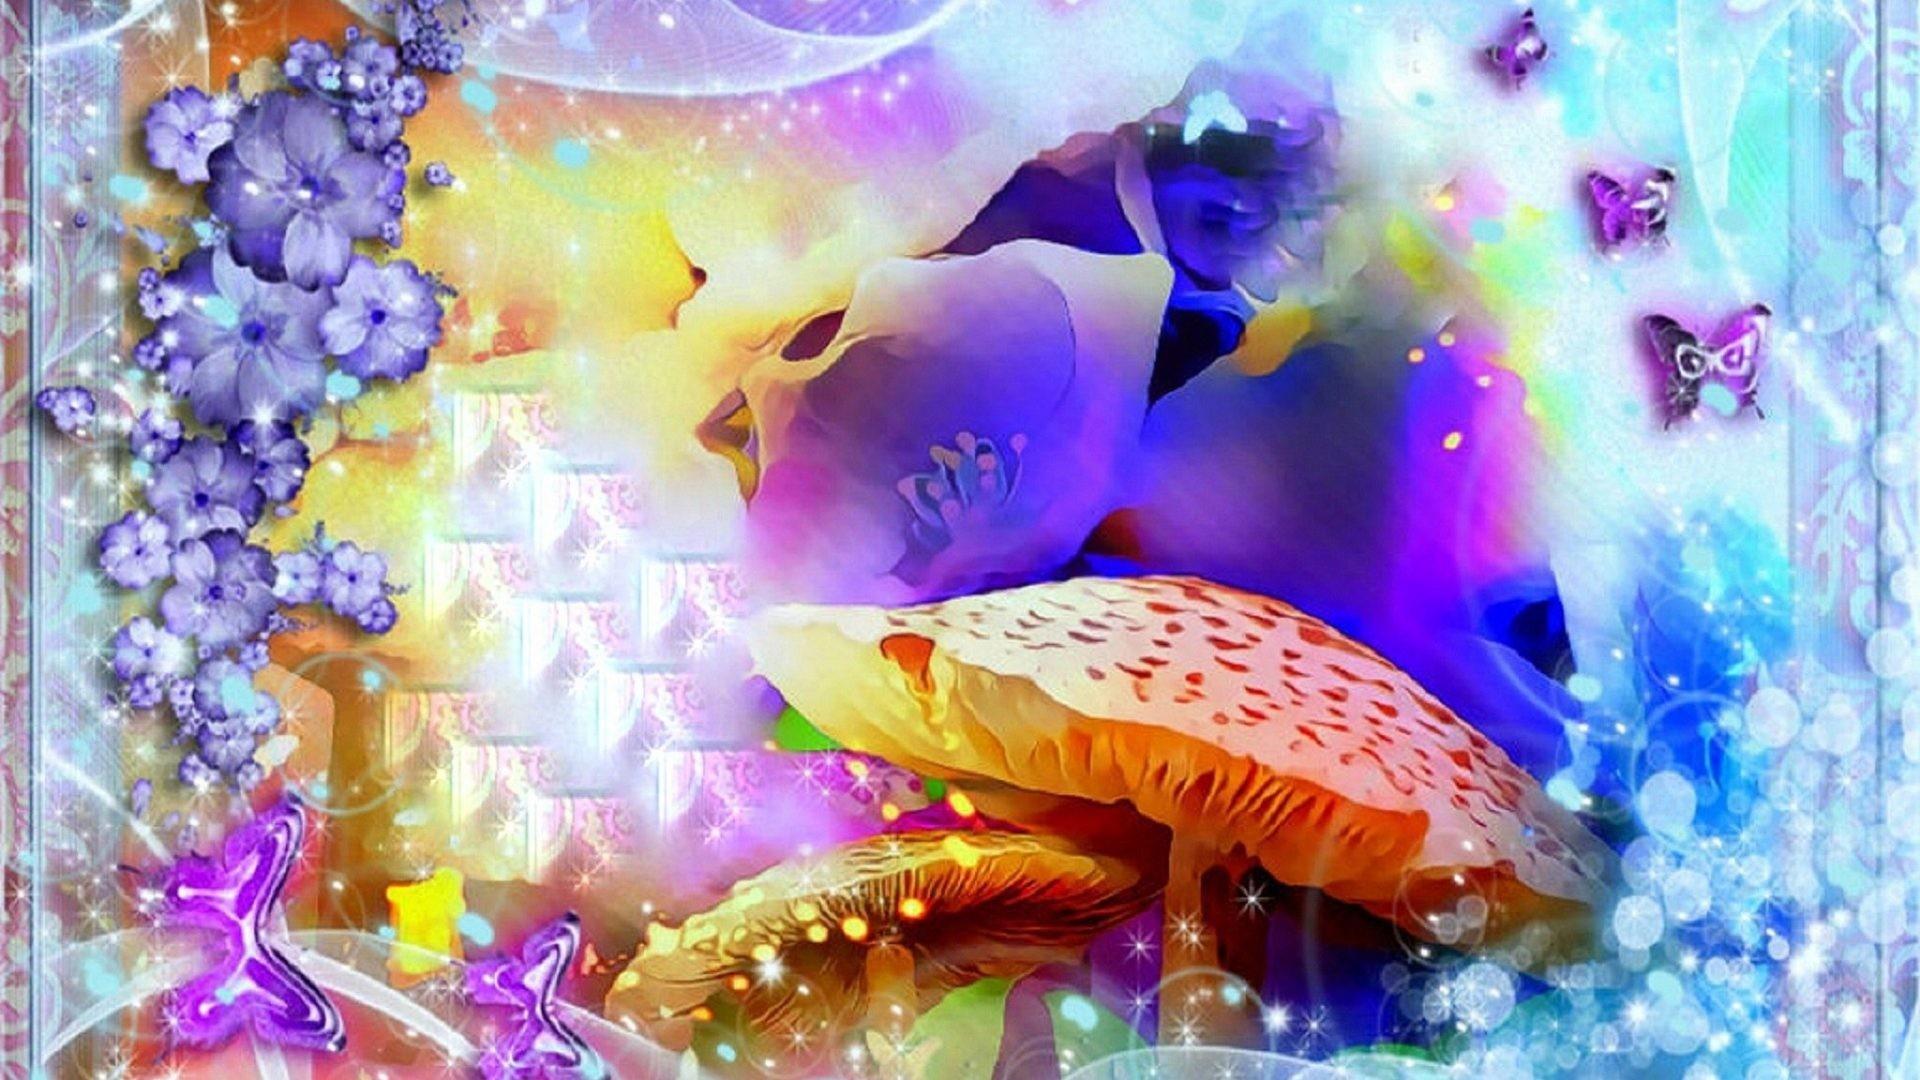 Wonderland Tag – Lovely Butterflies Colorful Drawings Designs Mushrooms  Paintings Attractions Beautiful Dreams Wonderland Spring Frame